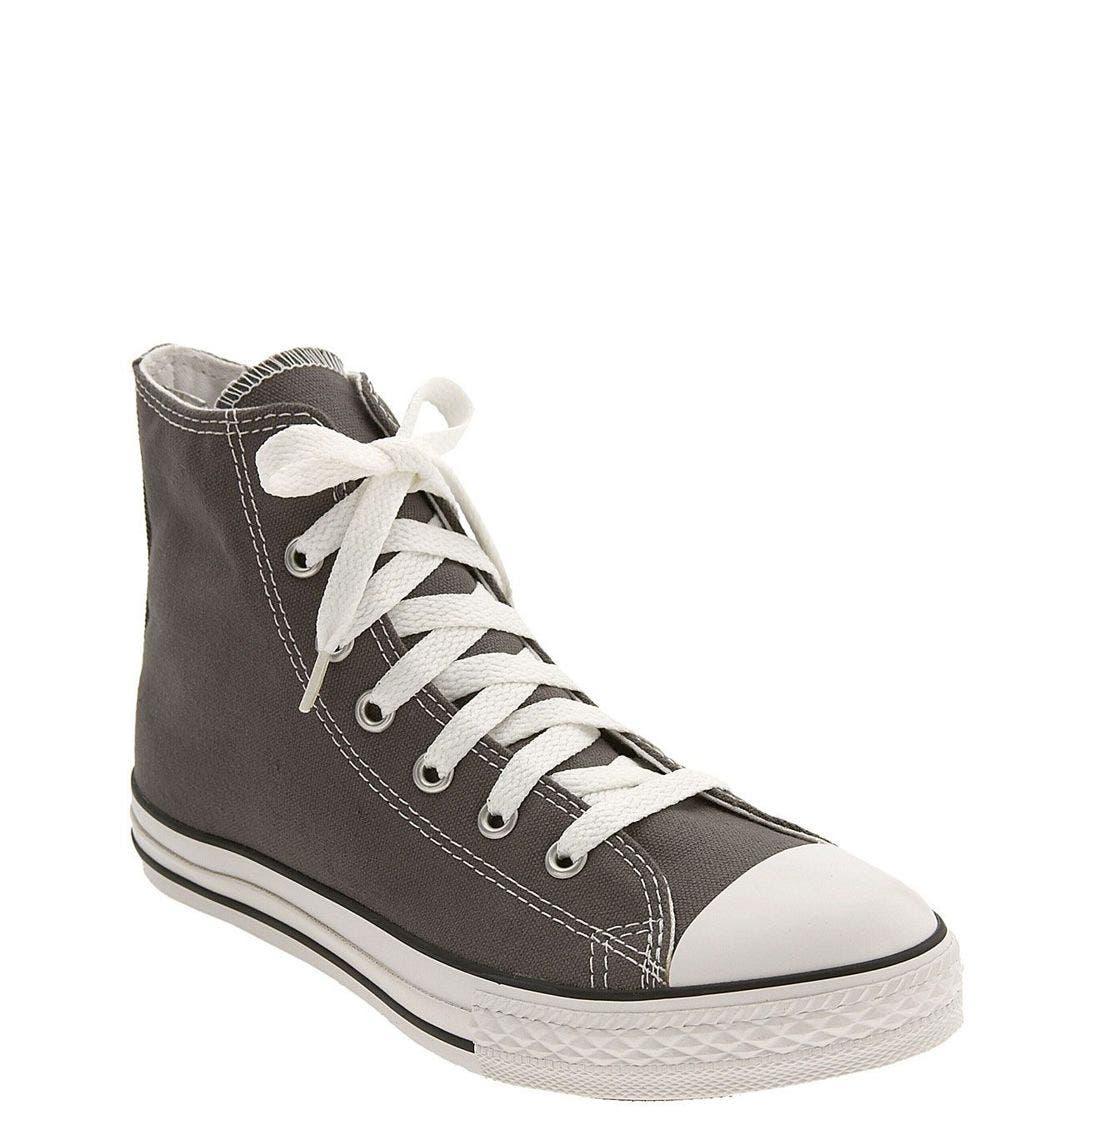 Main Image - Converse Chuck Taylor® High Top Sneaker (Baby, Walker & Toddler)